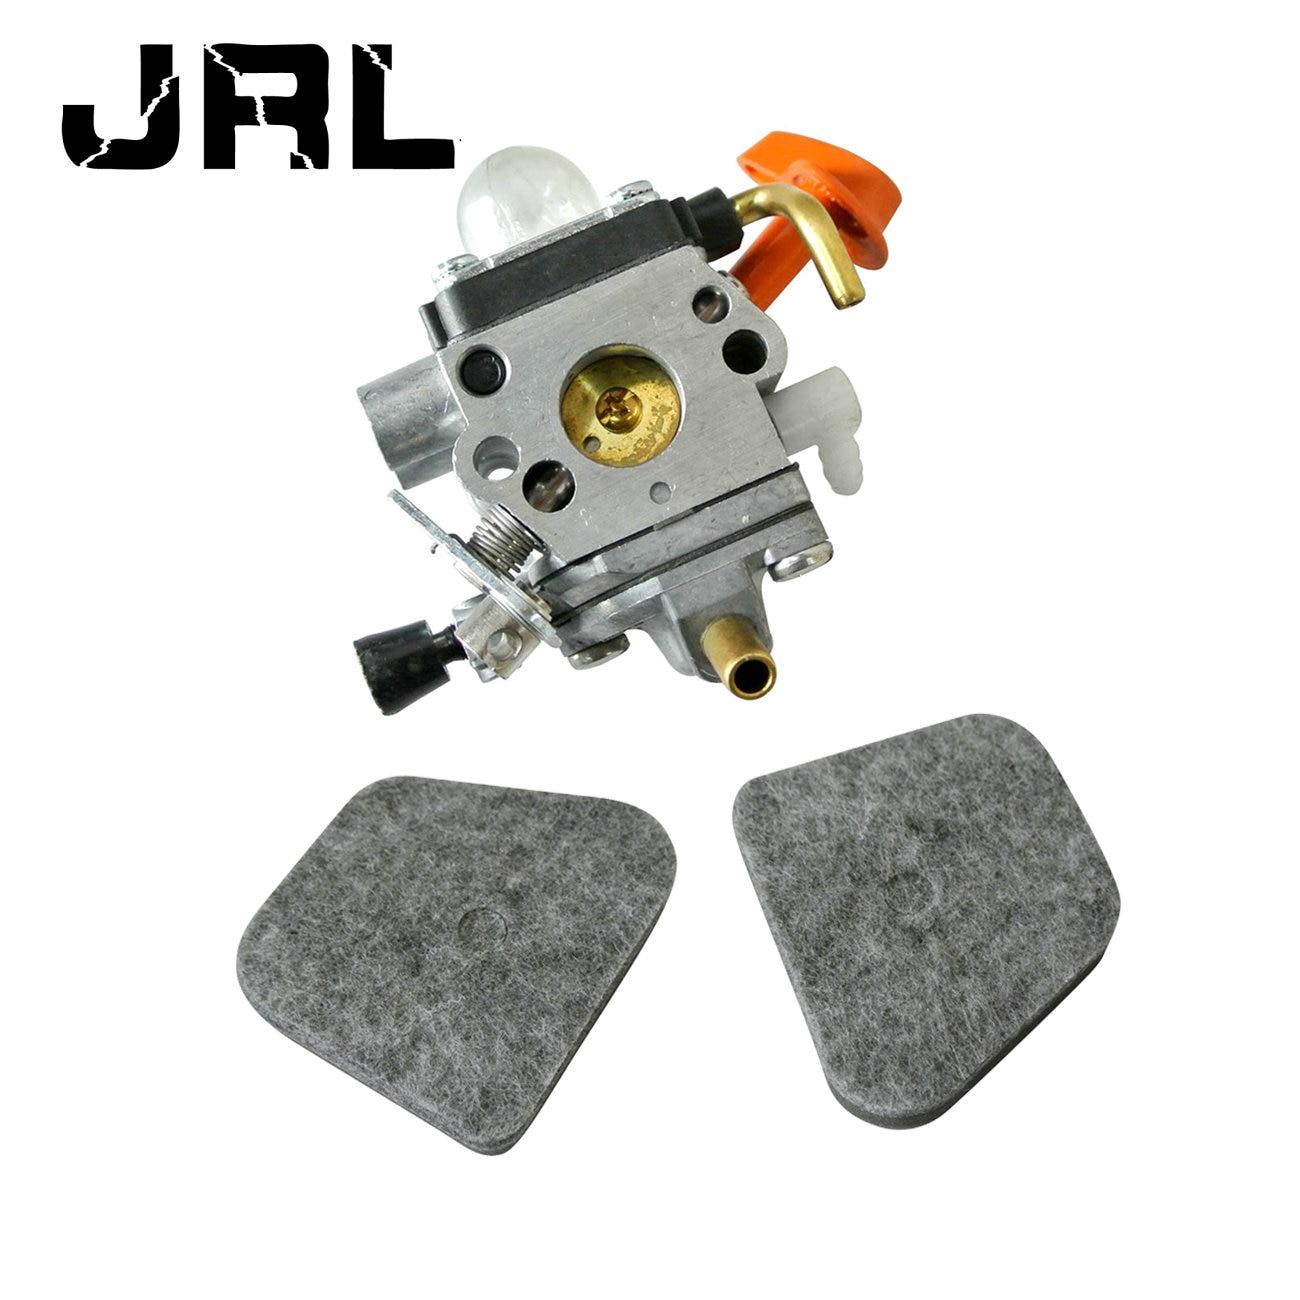 Carburetor Carby & Air Filters Fit STIHL FS90 FS110 Rep ZAMA C1Q-S173/4